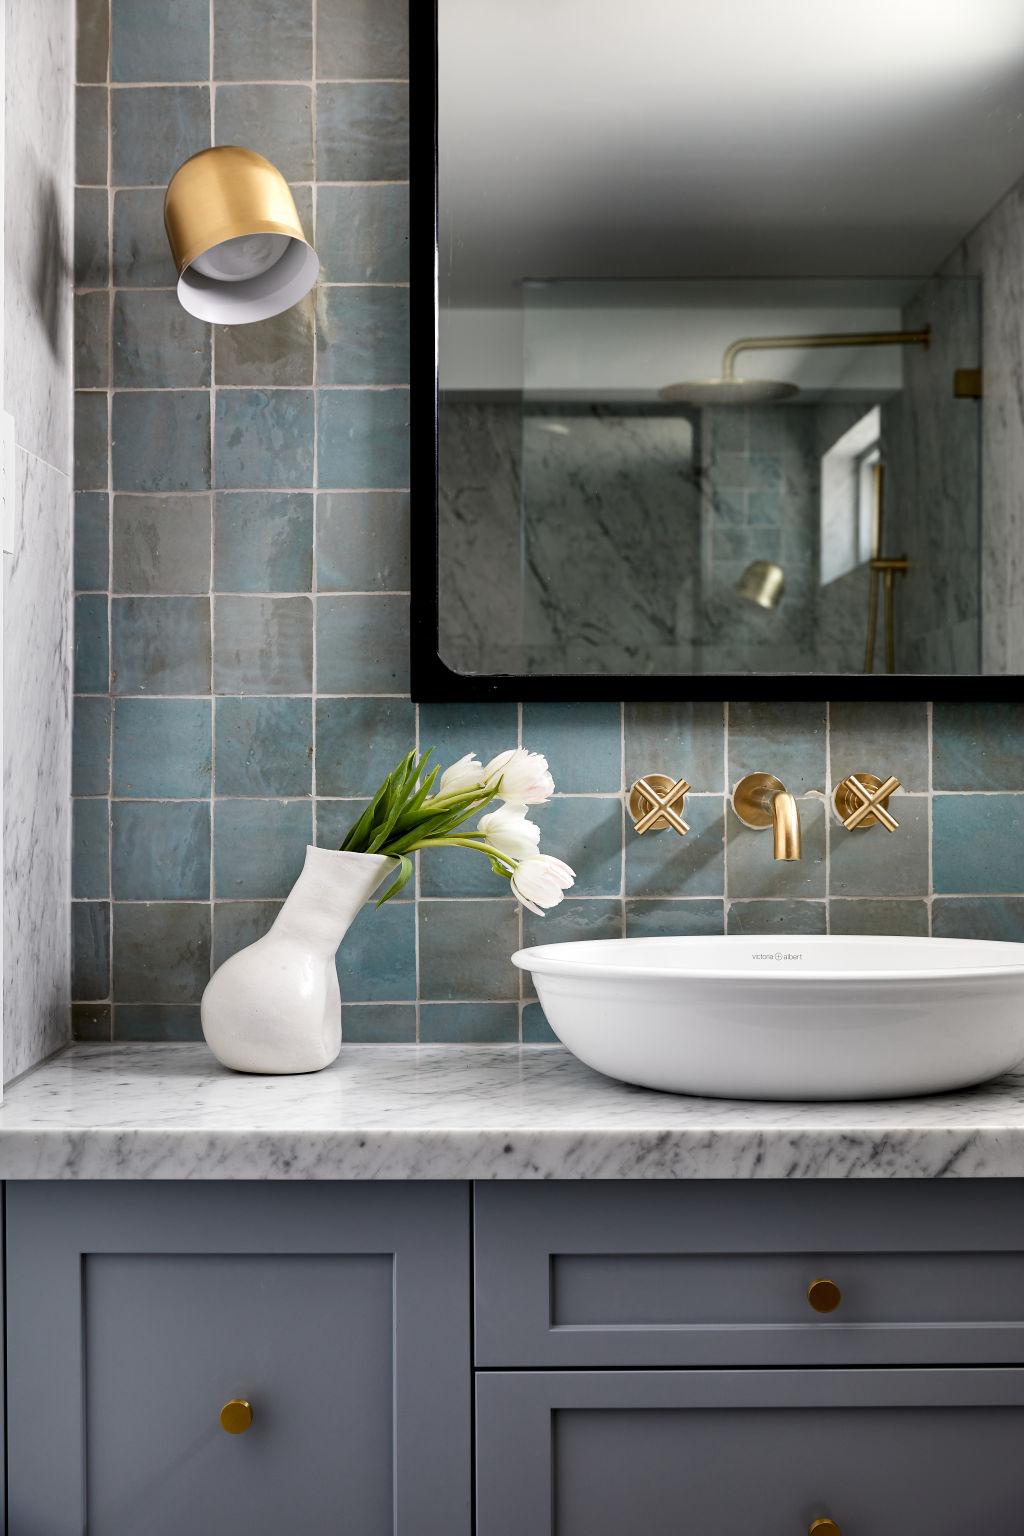 Bathroom_-_Harper_Lane_Design_-_Photographed_by_Ryan_Linnegar_mm6wyb